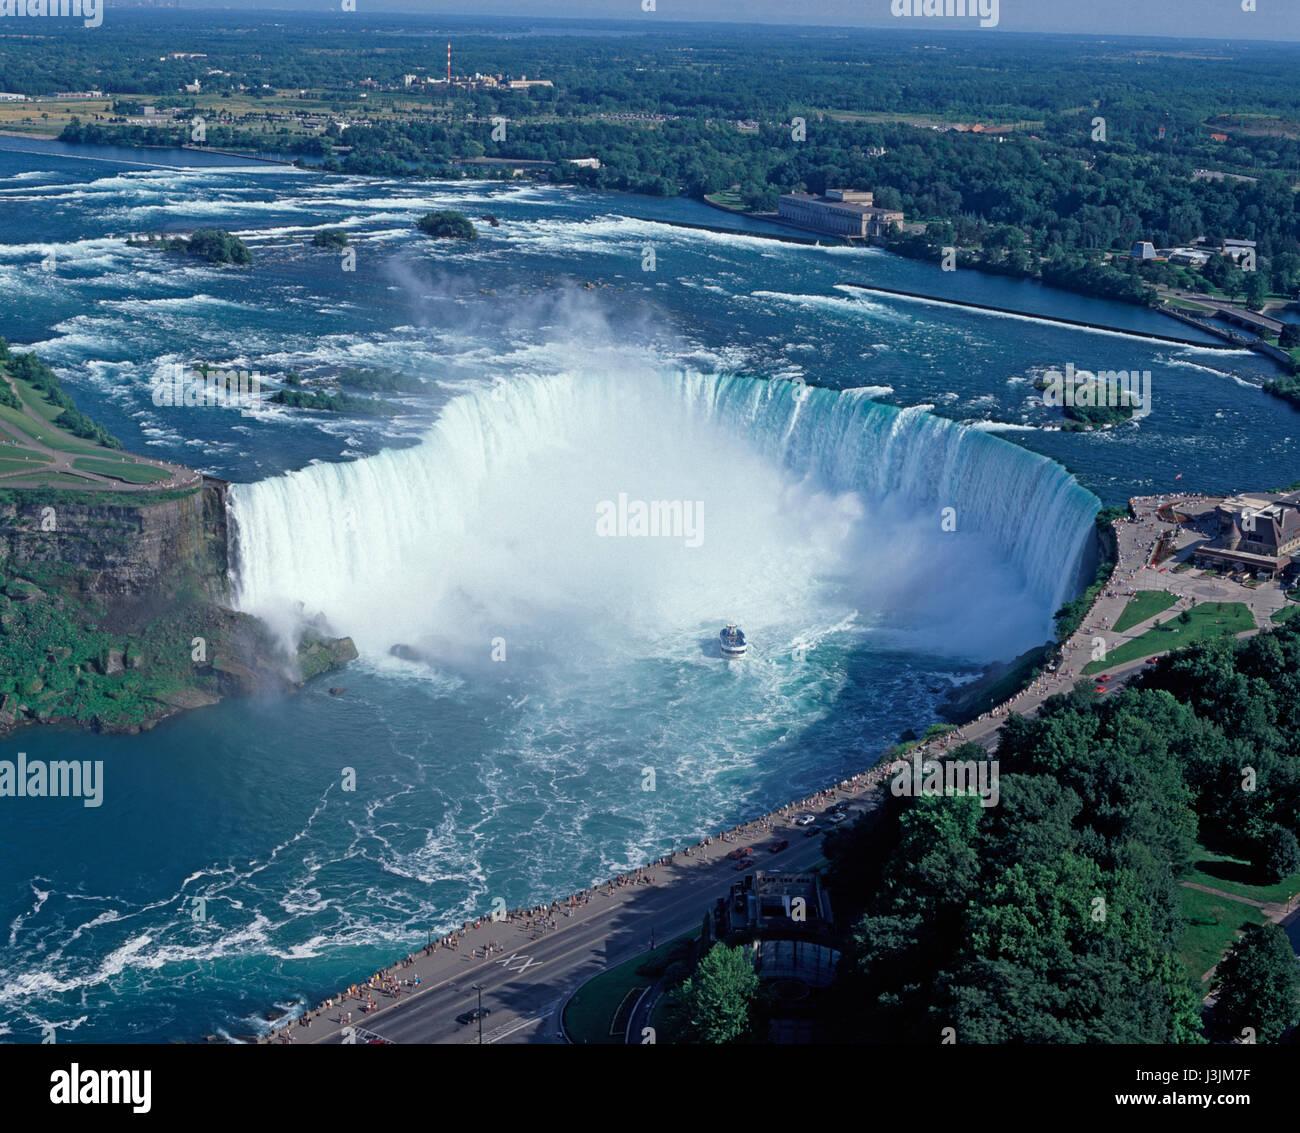 Niagara Falls et Maid of the Mist bateau de plaisance, Ontario, Canada Photo Stock